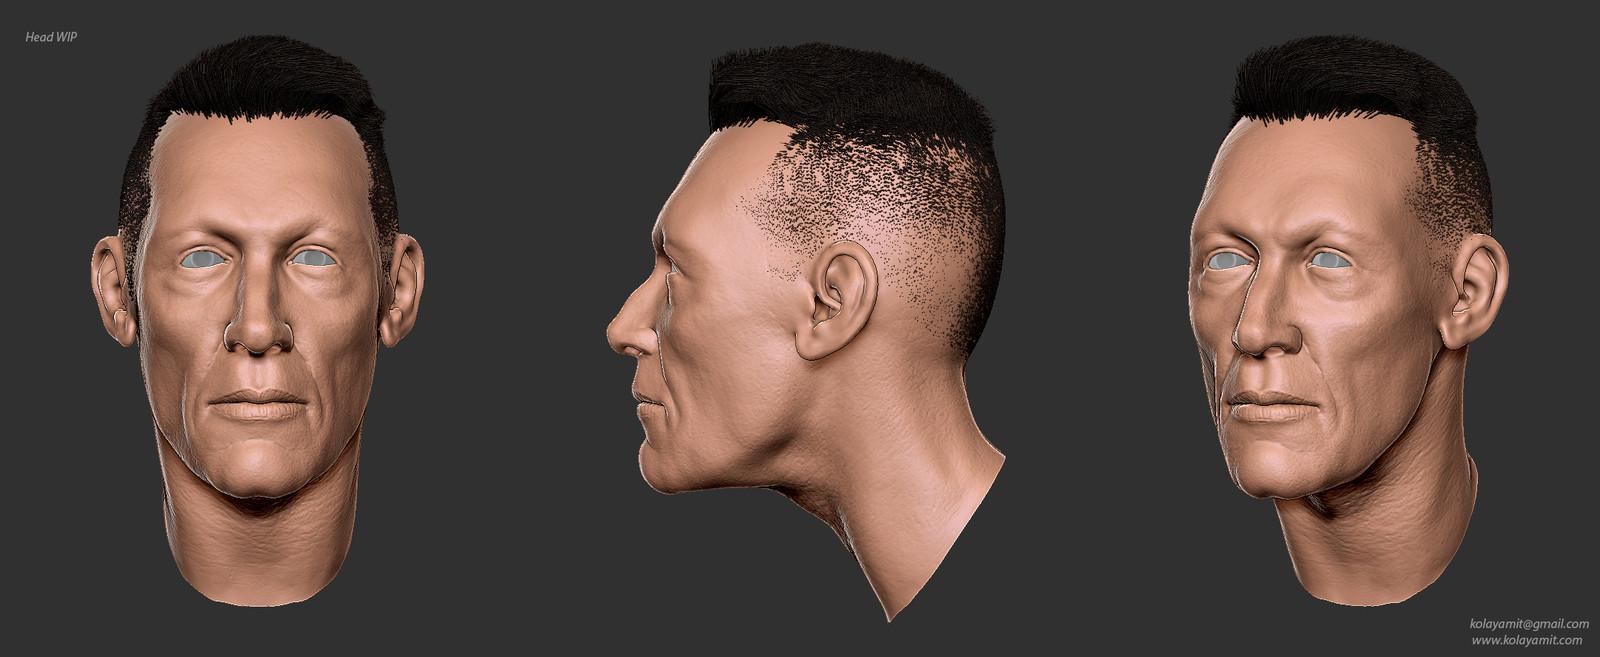 Head WIP